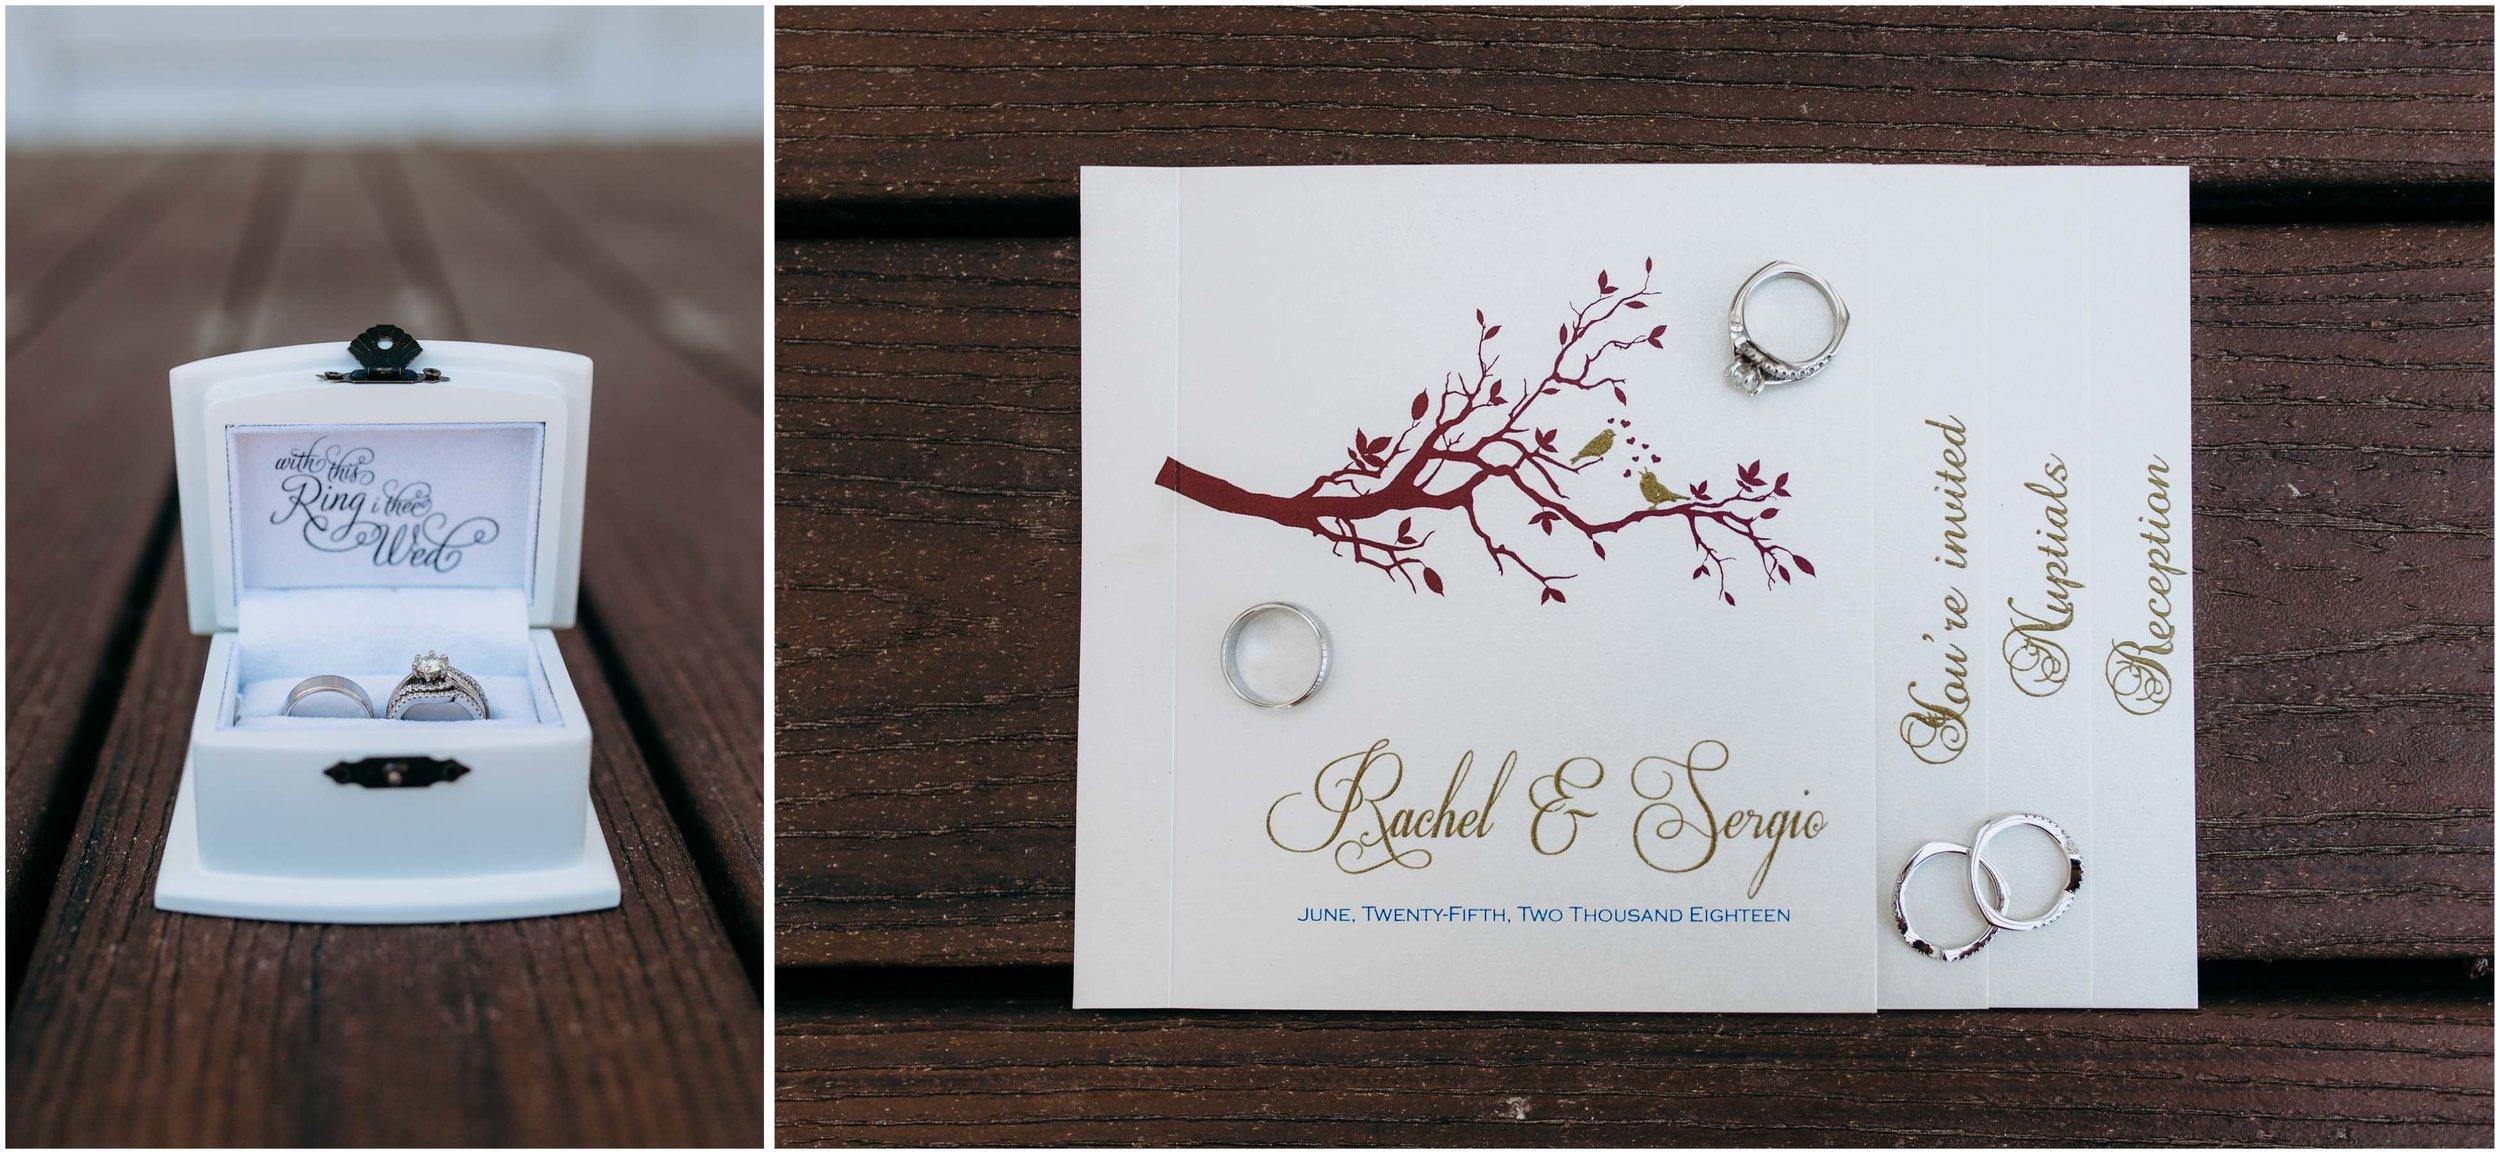 NH wedding photography, NH wedding photographer, wedding photographer NH, wedding photographers NH, wedding photography NH, invitations